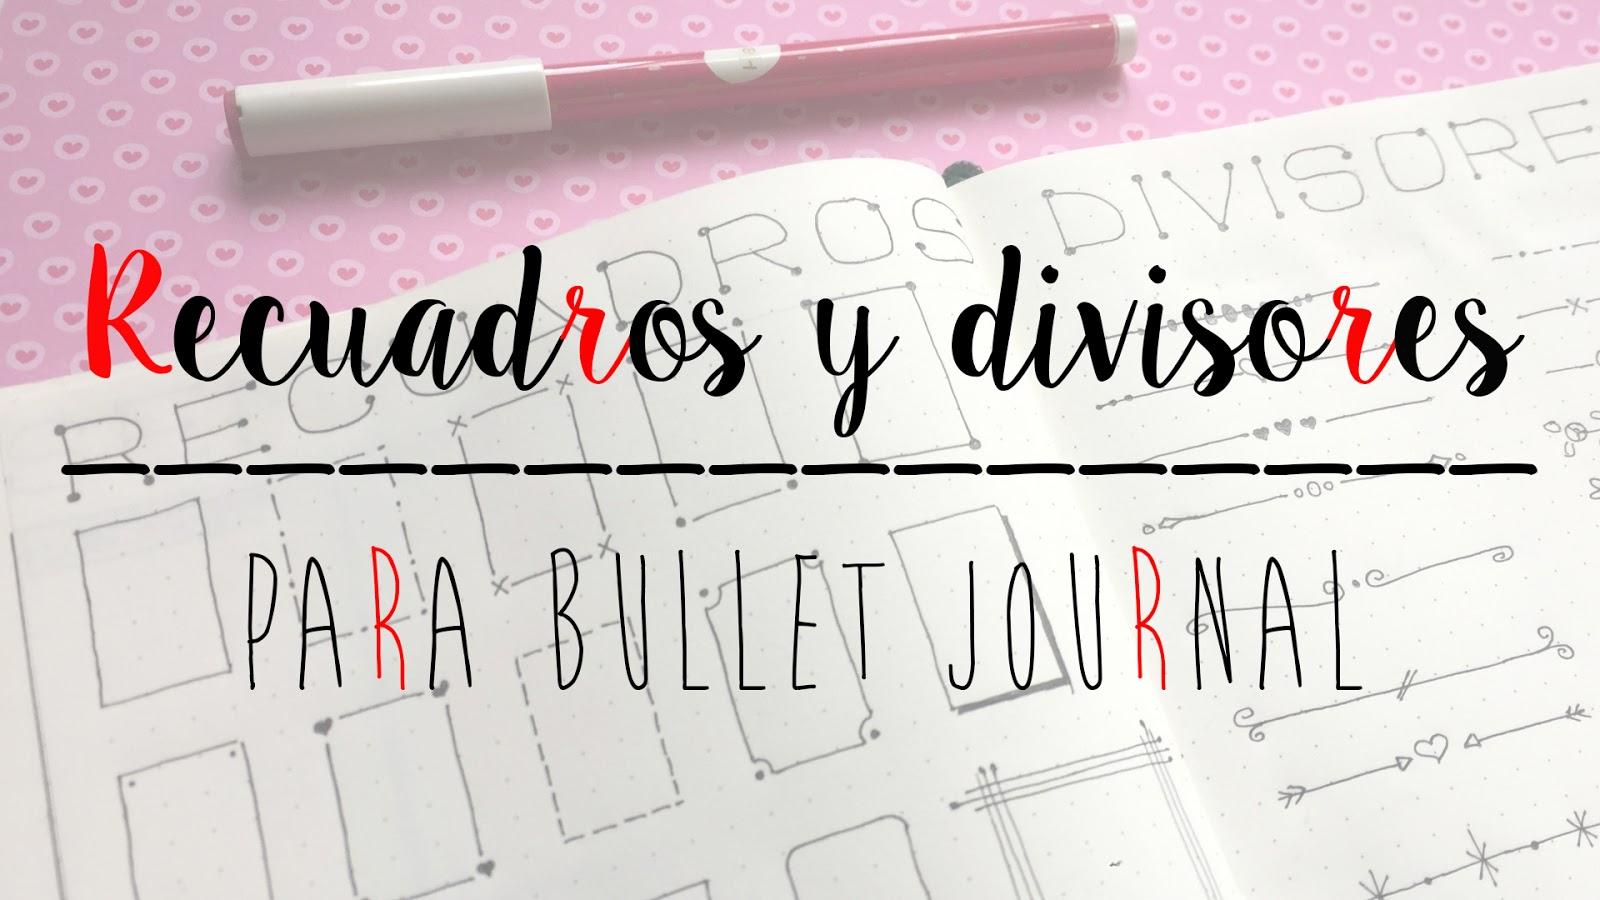 RECUADROS Y DIVISORES PARA BULLET JOURNAL